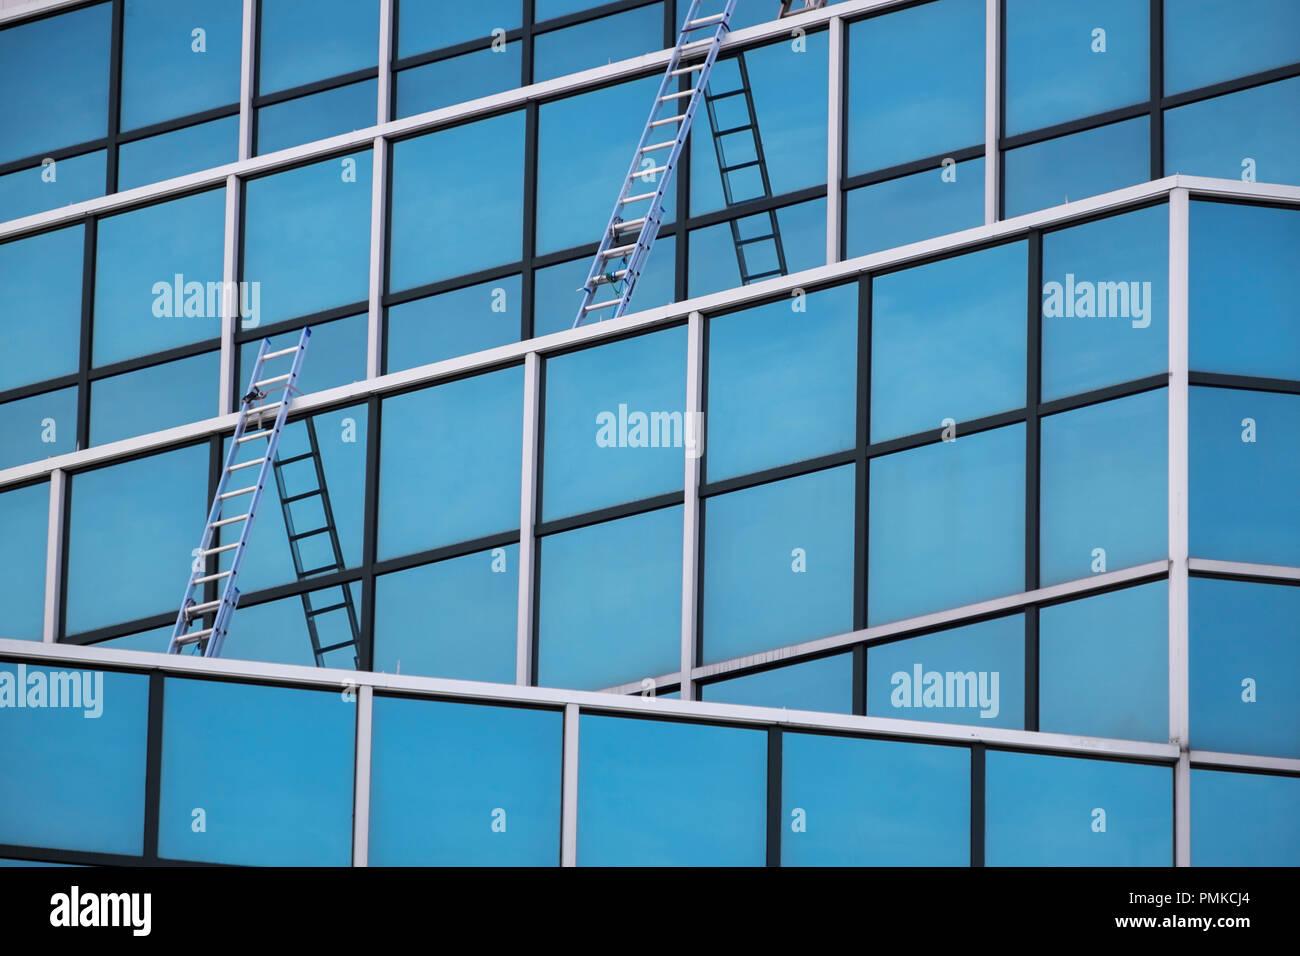 Abstract Architecture, Birmingham, Alabama - Stock Image